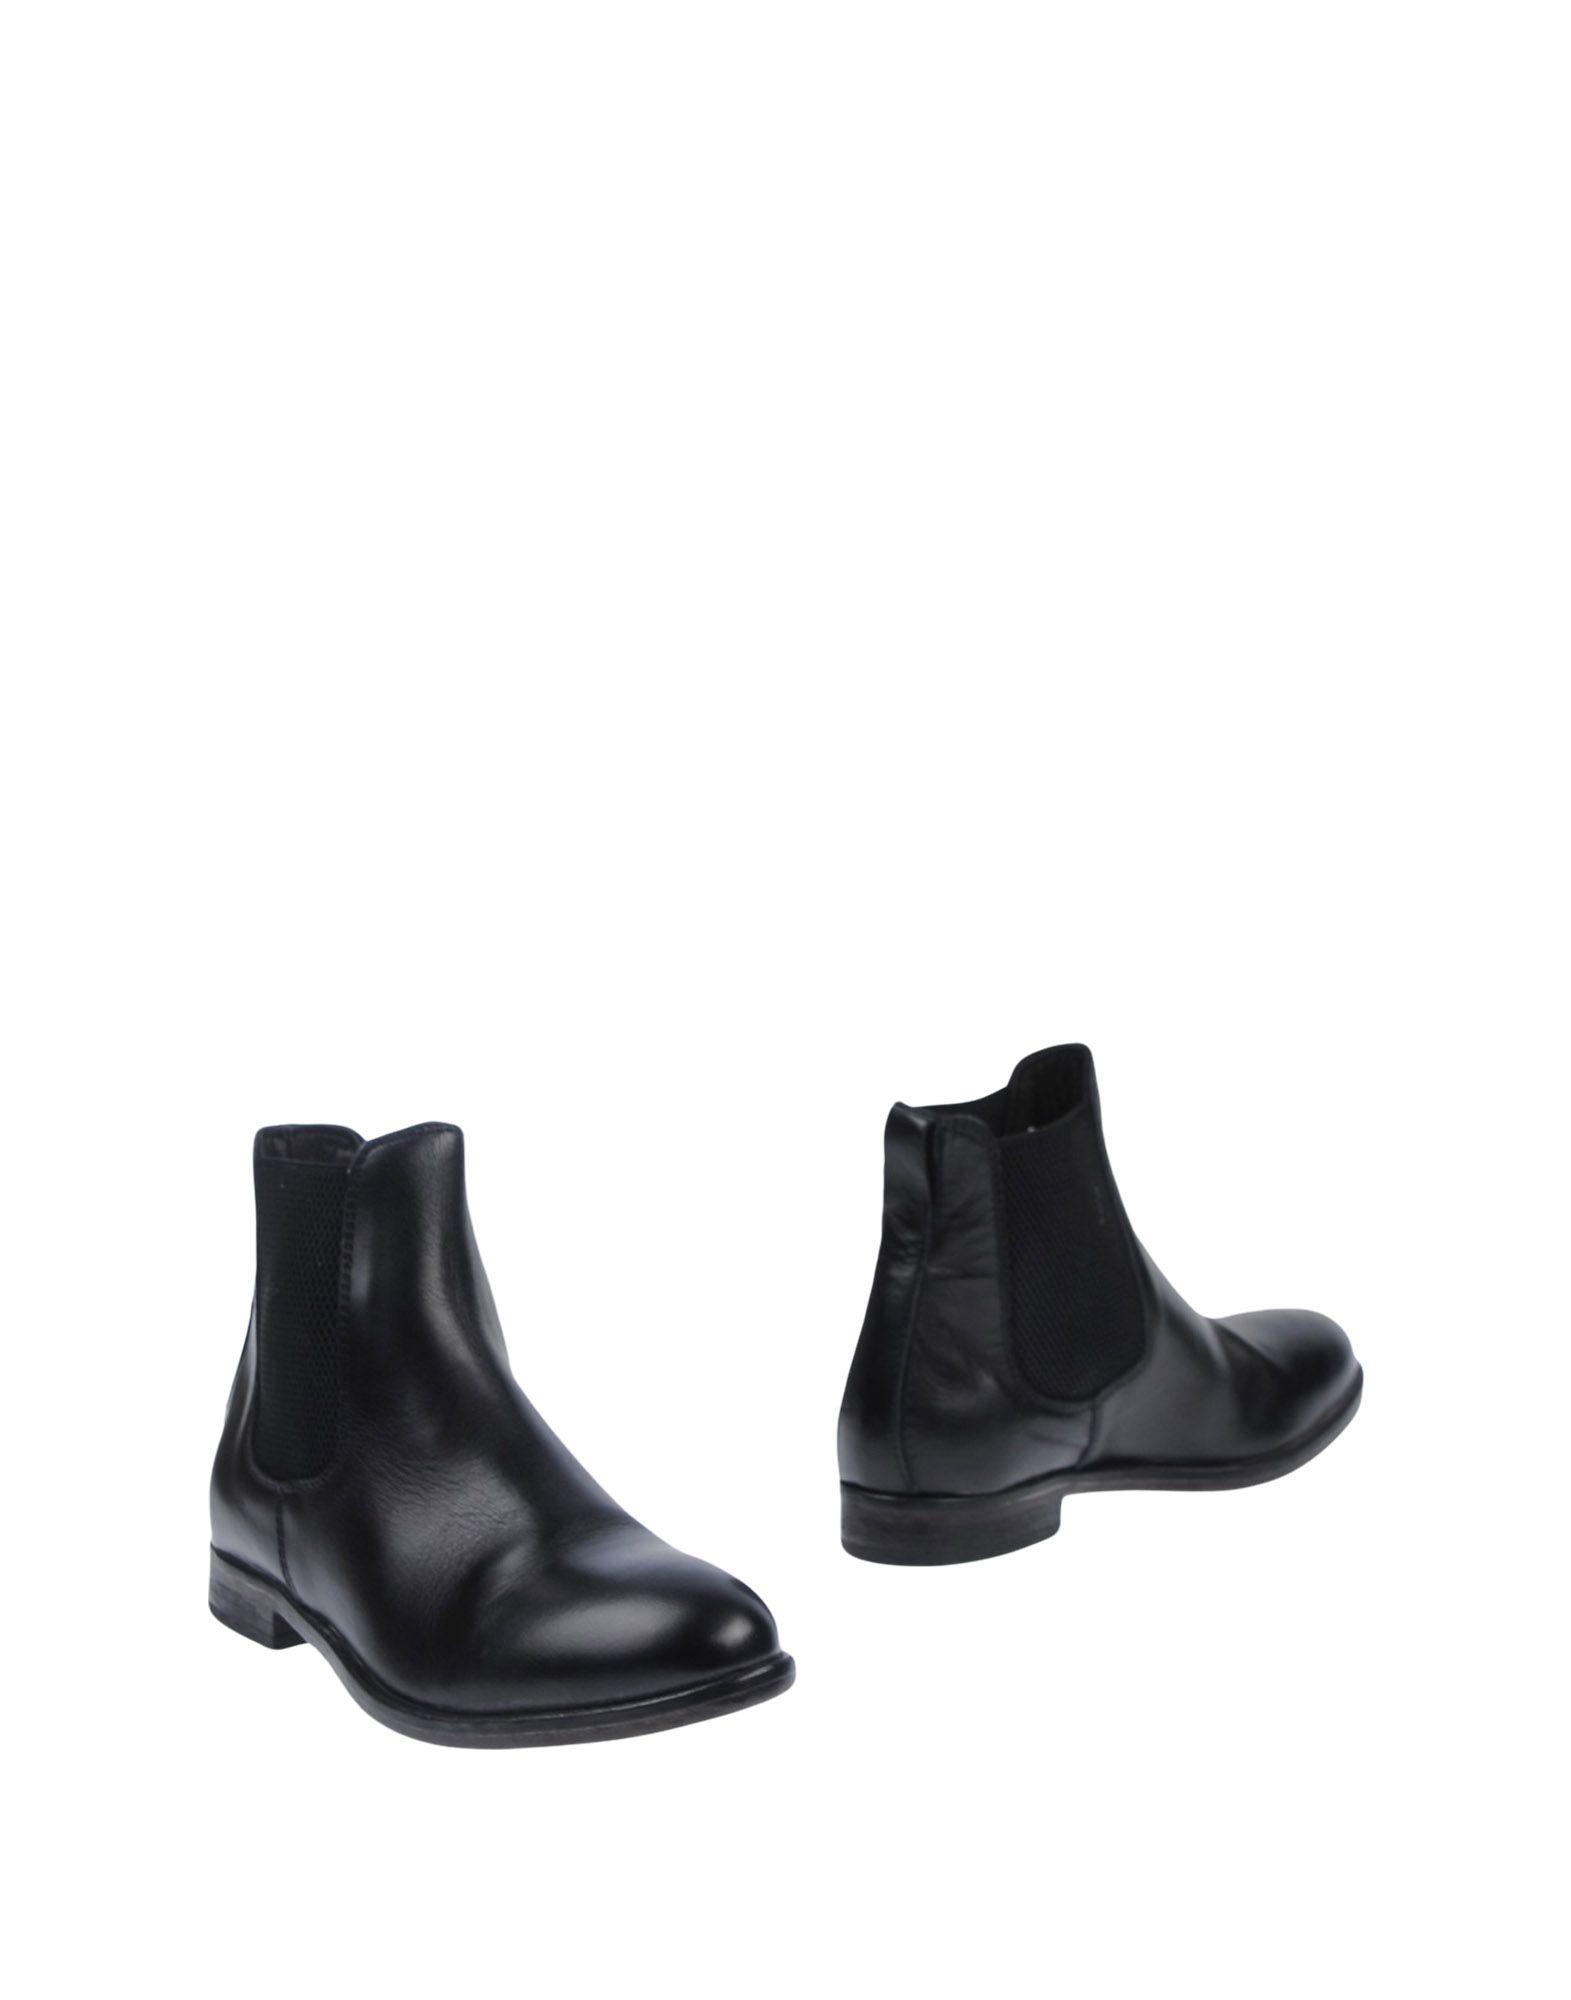 Moma Chelsea Boots Damen  11508442BKGut aussehende strapazierfähige Schuhe